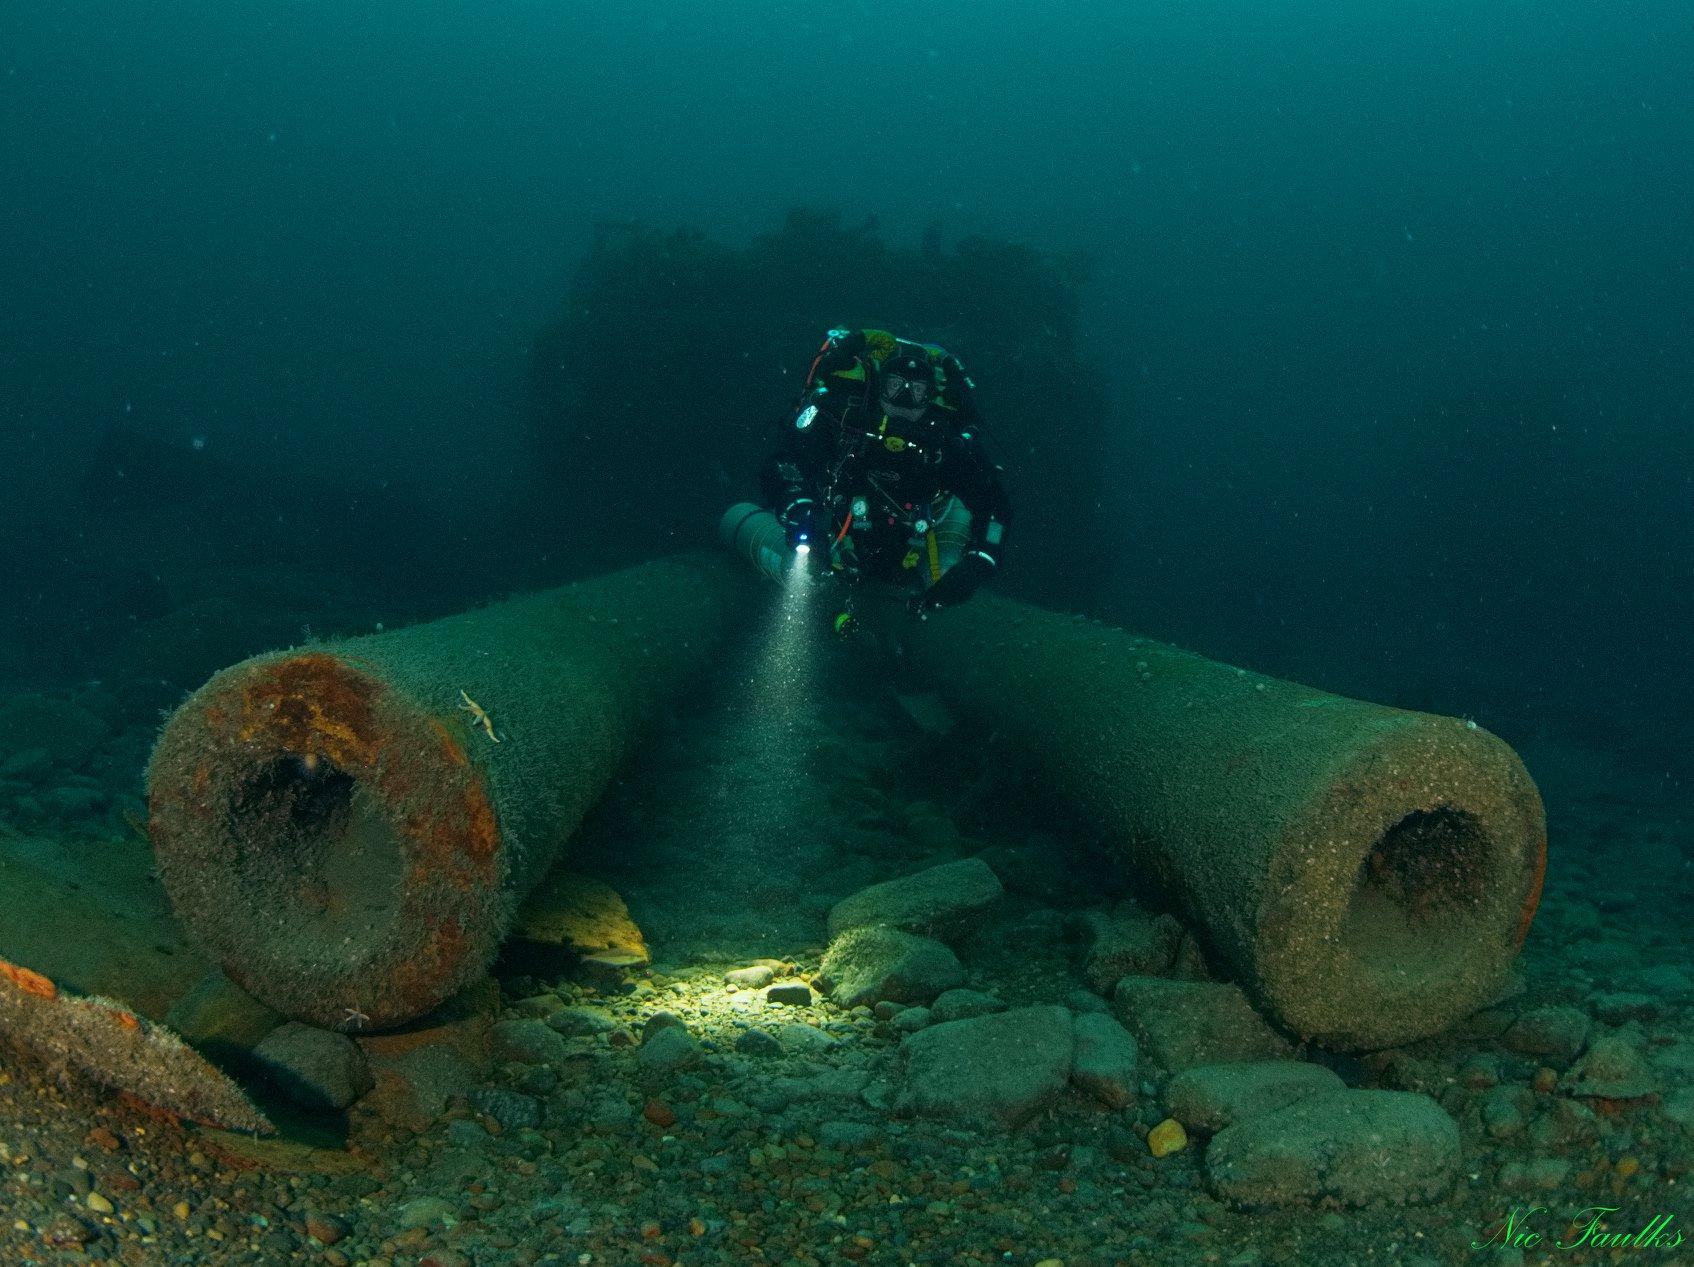 Ireland Wreck Tour HMS Audacious (-65 m) di Andrea Murdock Alpini